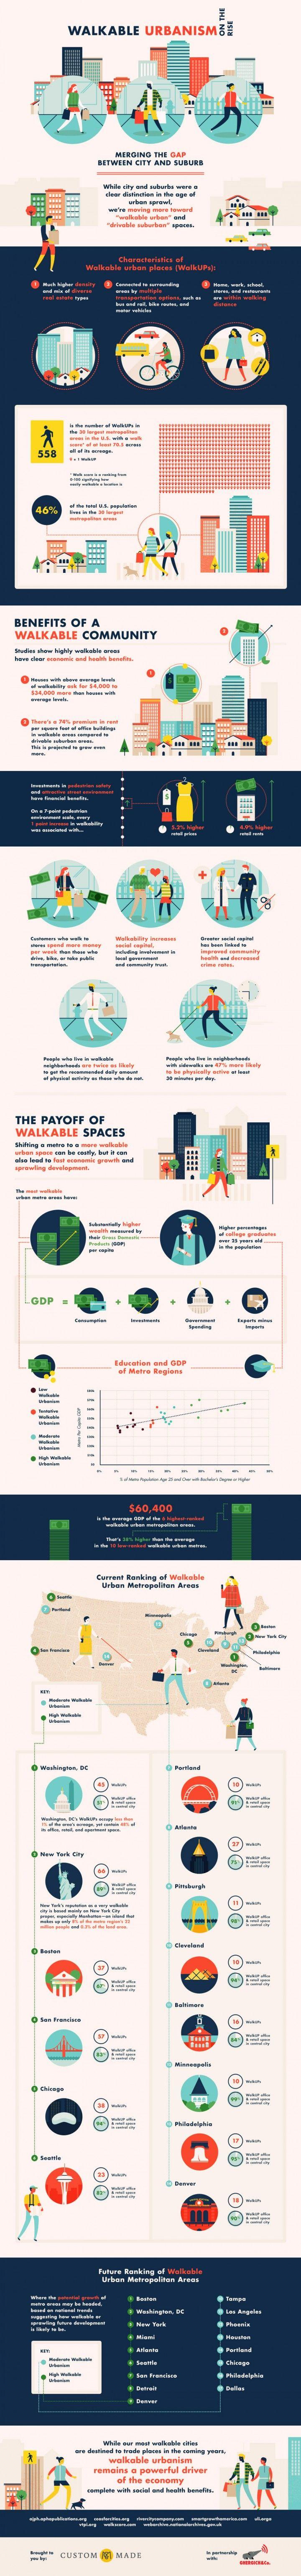 Walkable Urbanism on the Rise #walk #urbanization #urbanplanning